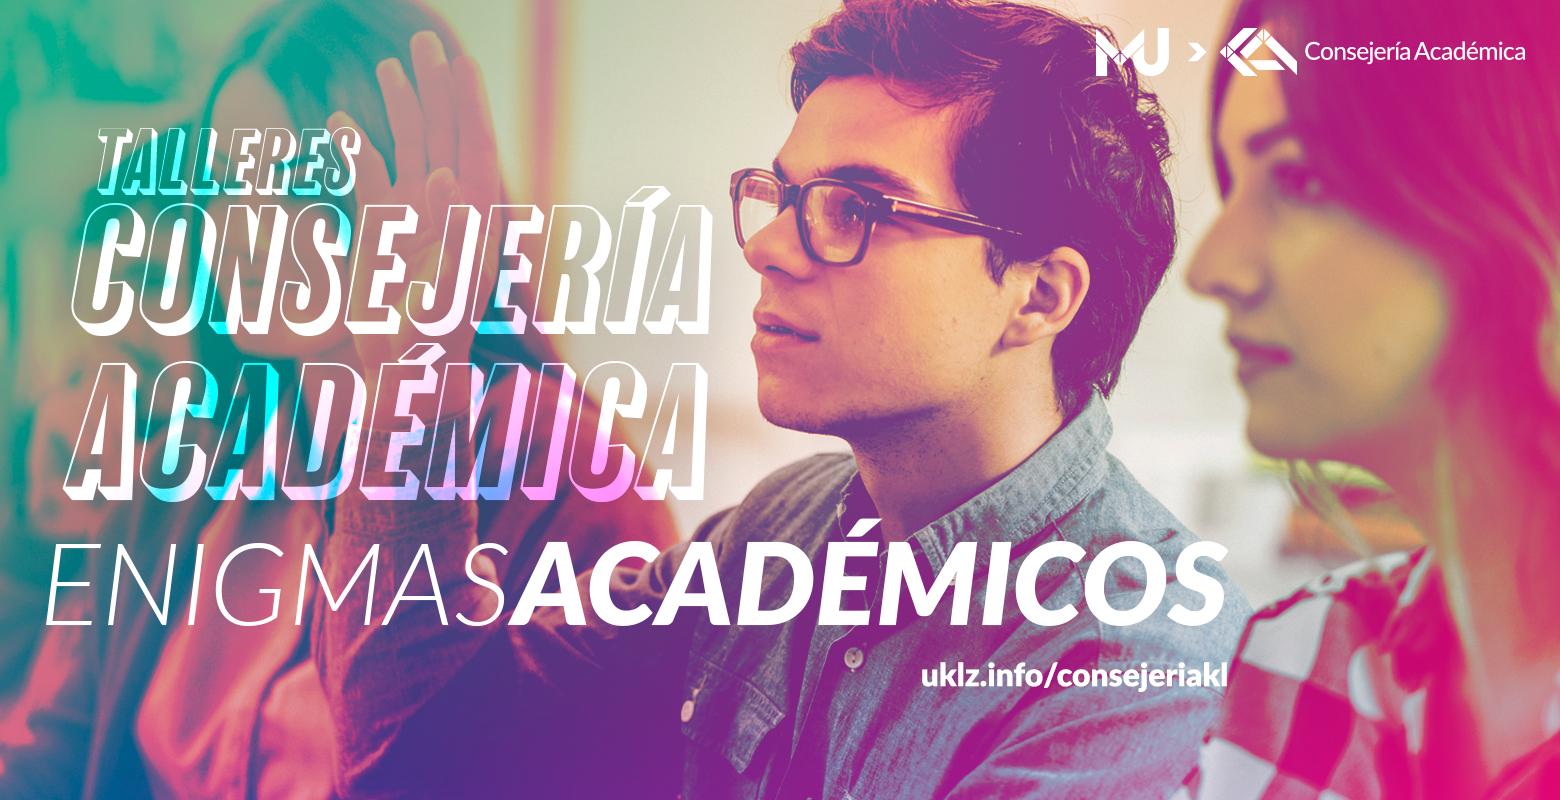 Enigmas Académicos- Talleres Consejería Académica